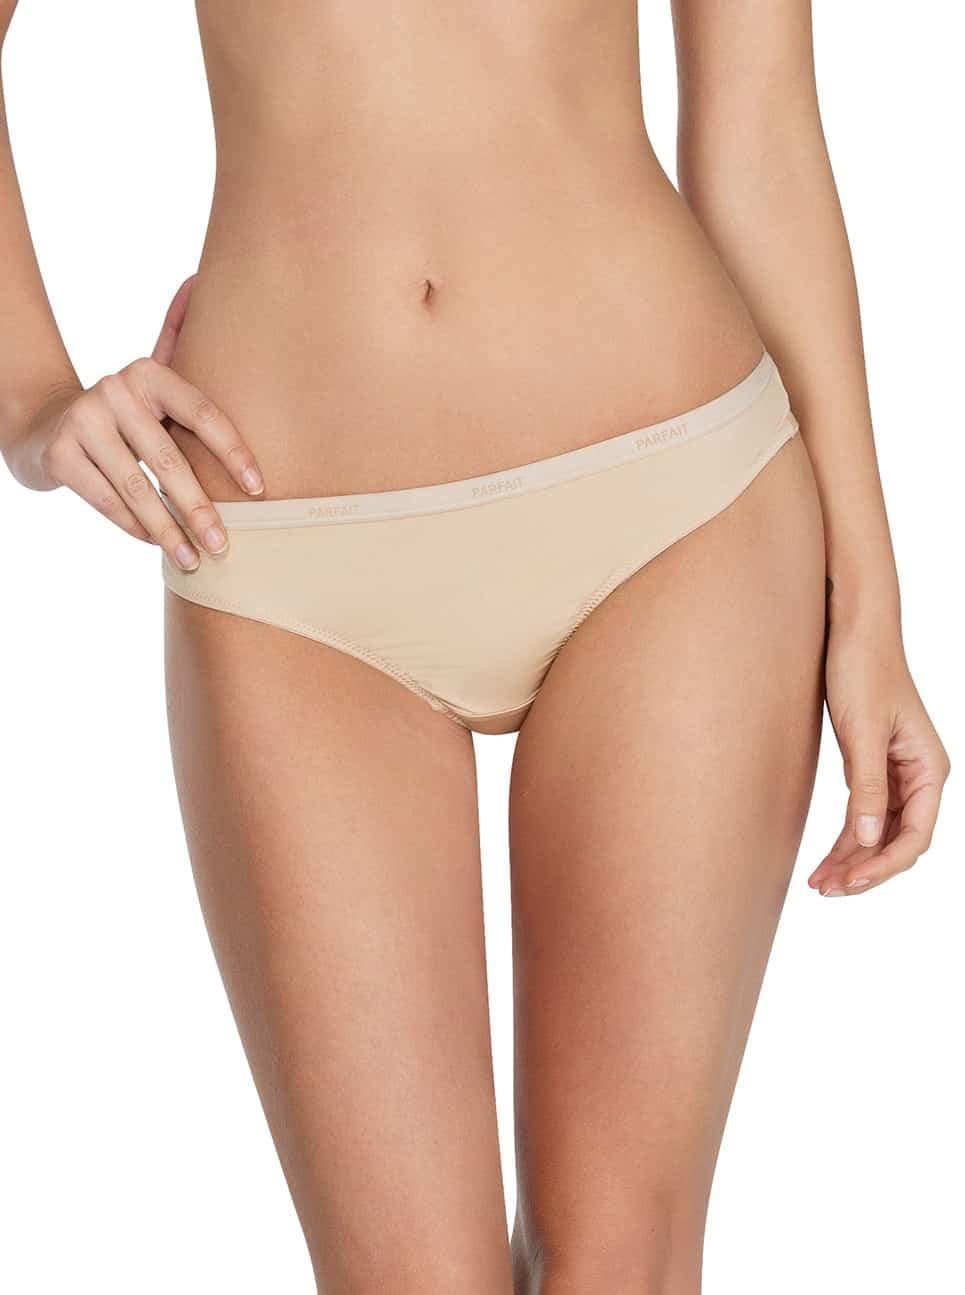 Lynn BrazilianThongP13014 Nude Front - Lynn Brazilian Thong - European Nude - P13014